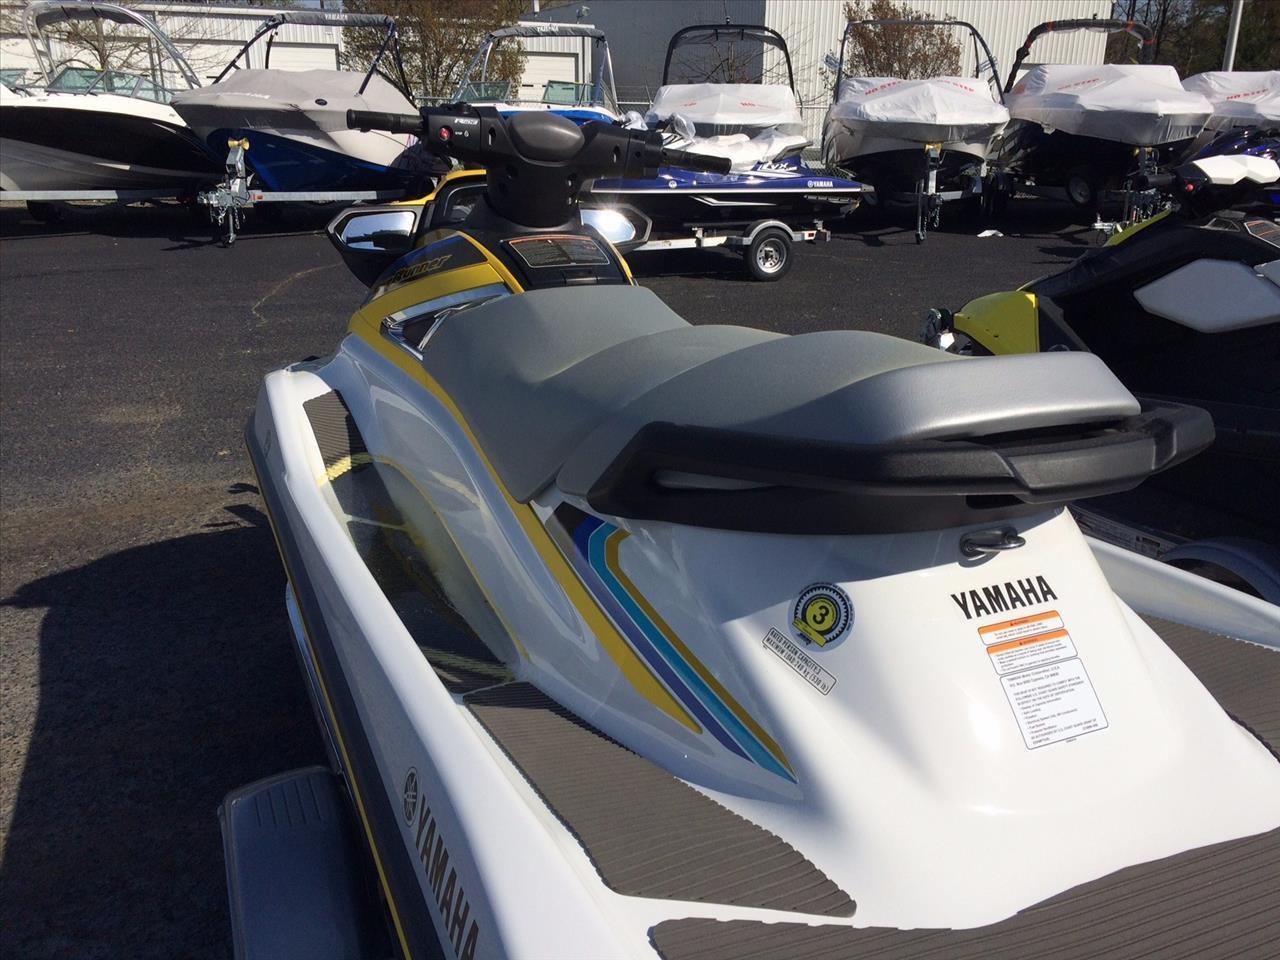 2016 Yamaha VX for sale at Vehicle Network, LLC - Performance East, INC. in Goldsboro NC